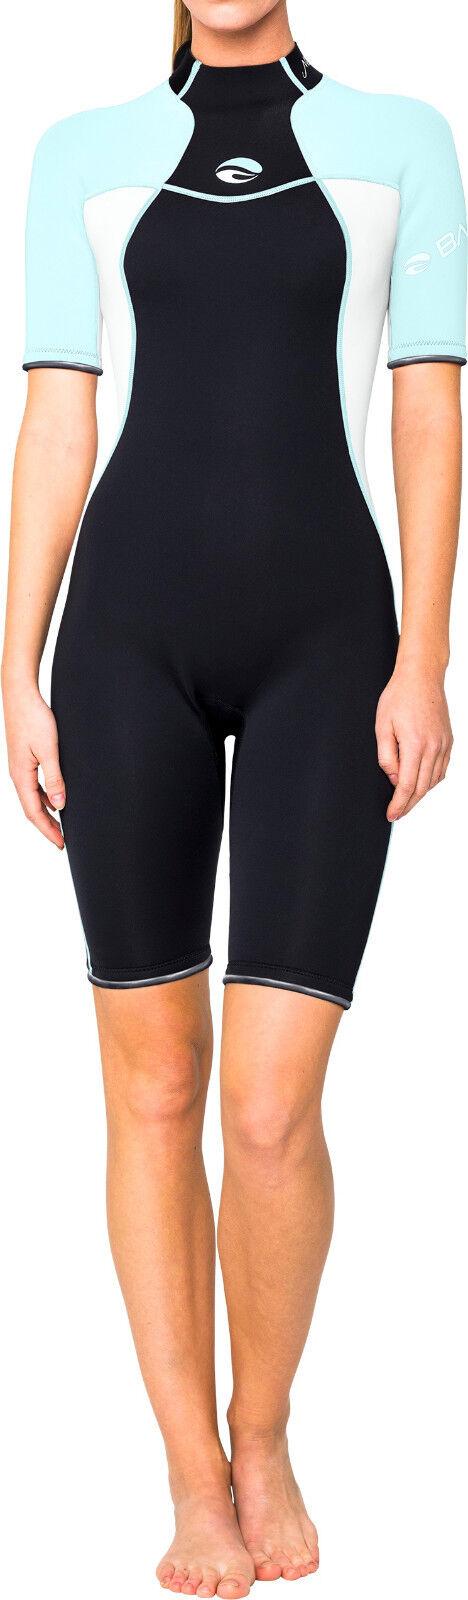 Bare 2mm Nixie Shorty Scuba Diving Wetsuit Women's blueee